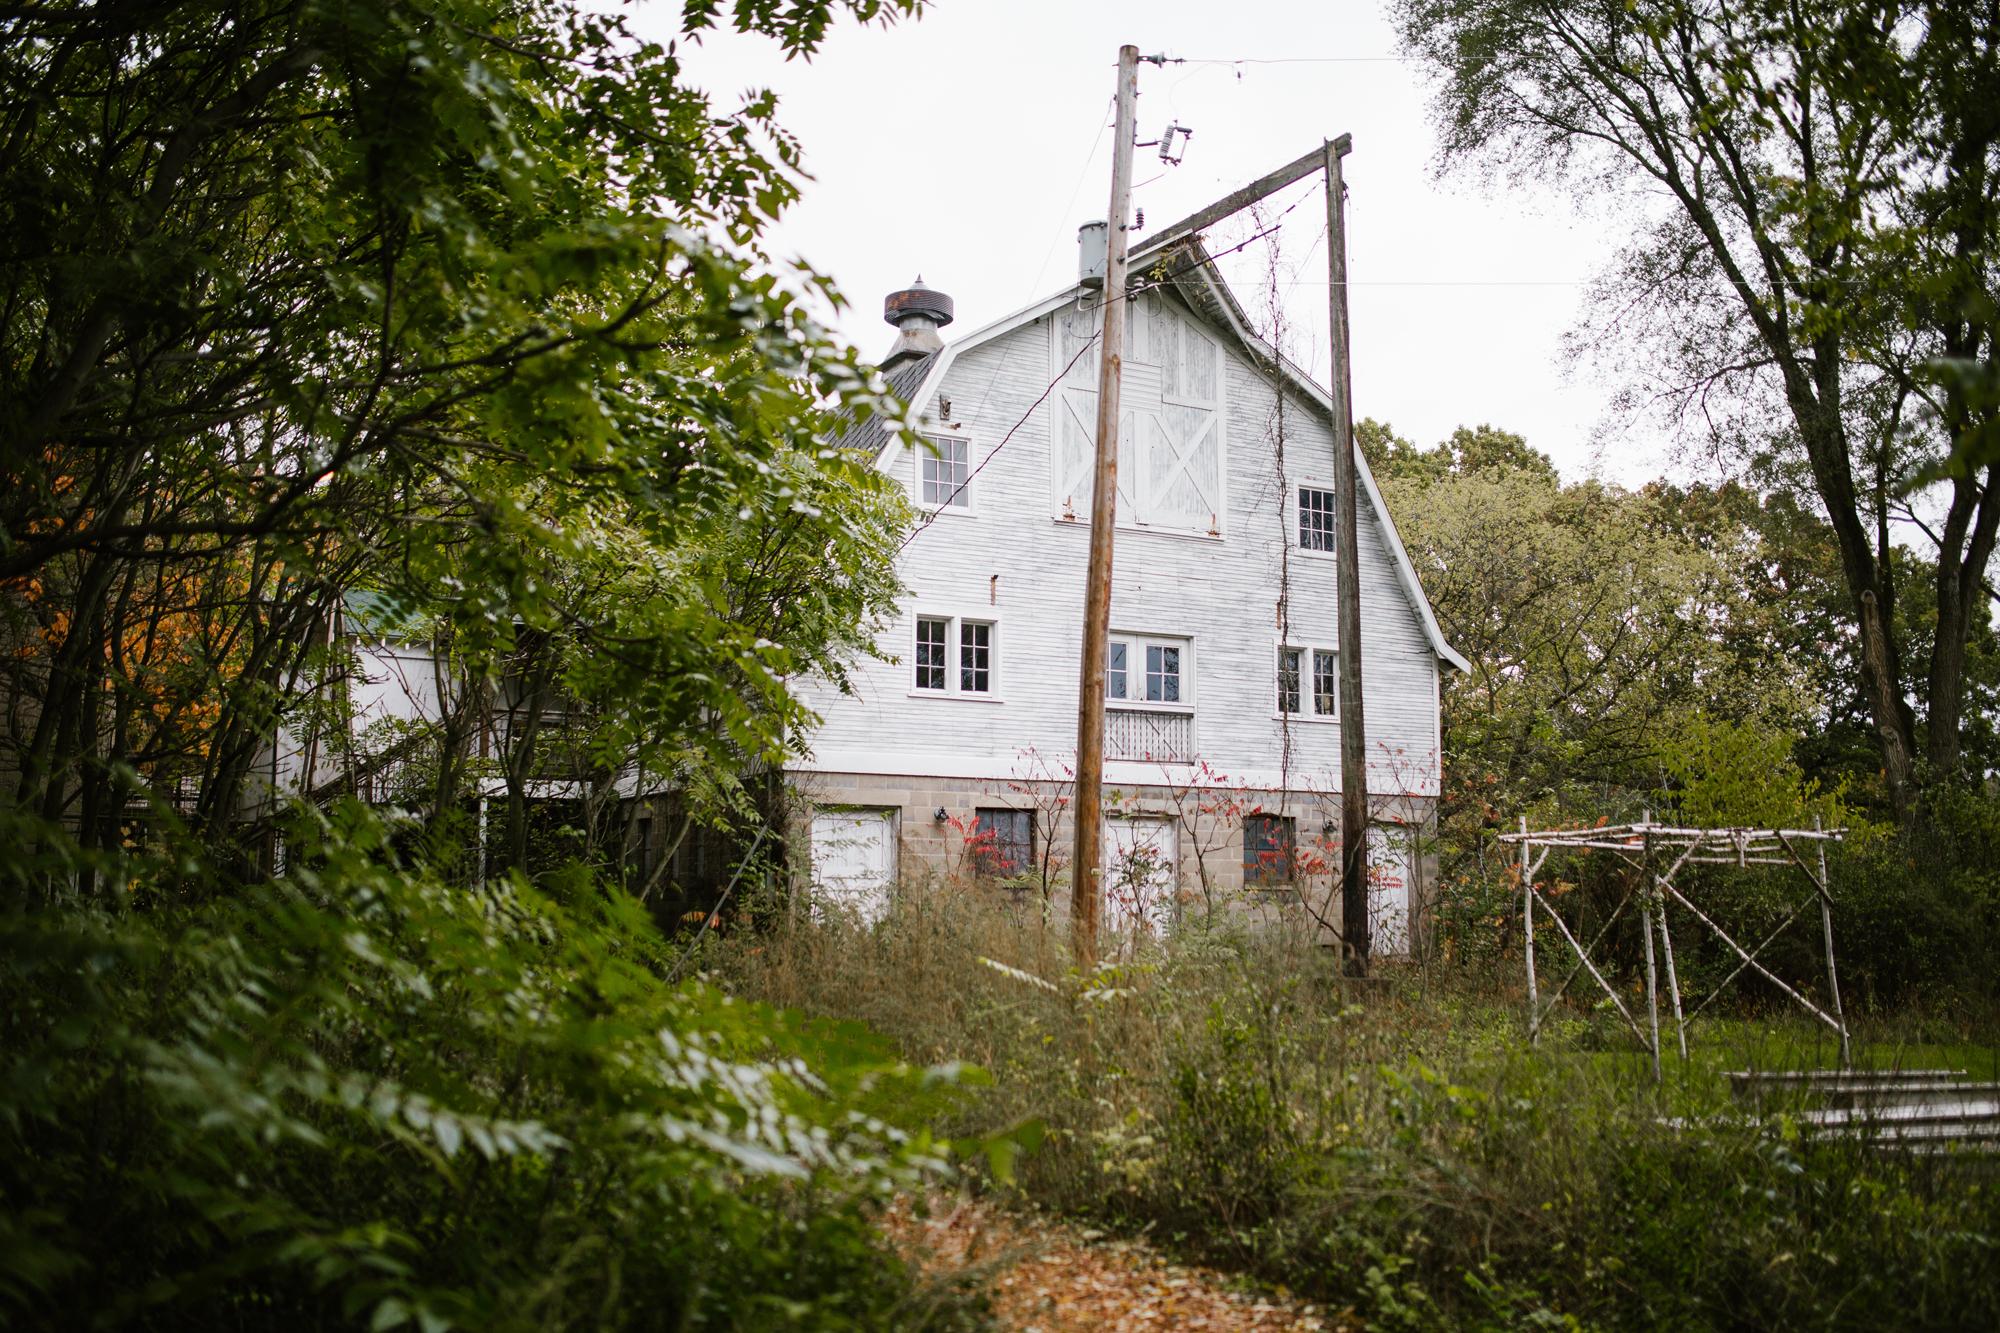 blue-dress-barn-benton-harbor-michigan-wedding-photographer (1).jpg